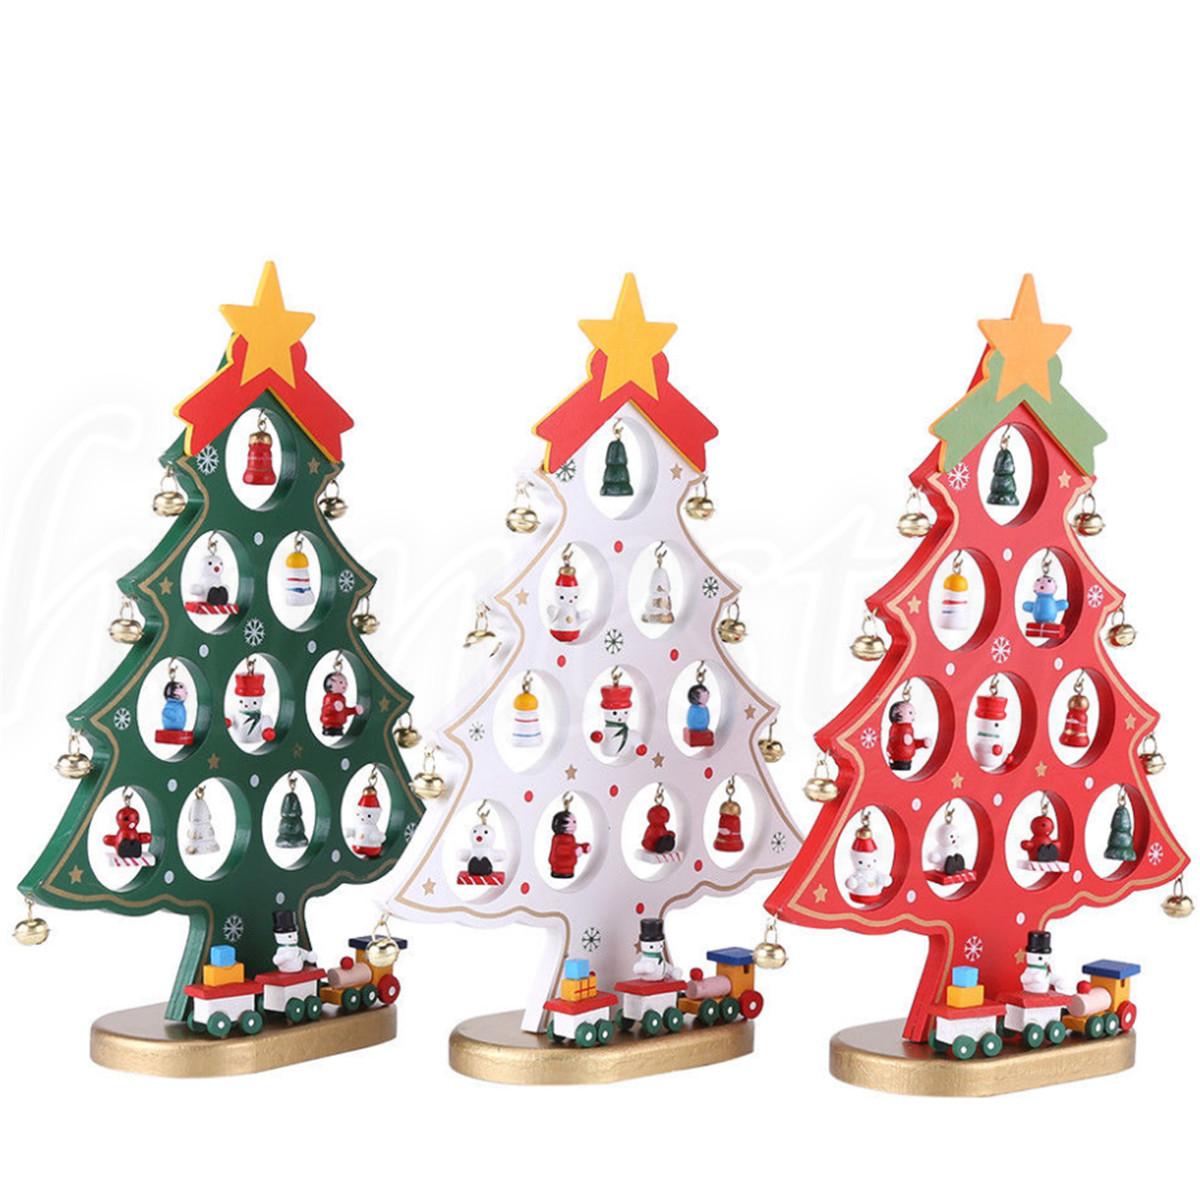 diy cartoon christmas tree decorations desk ornaments for home